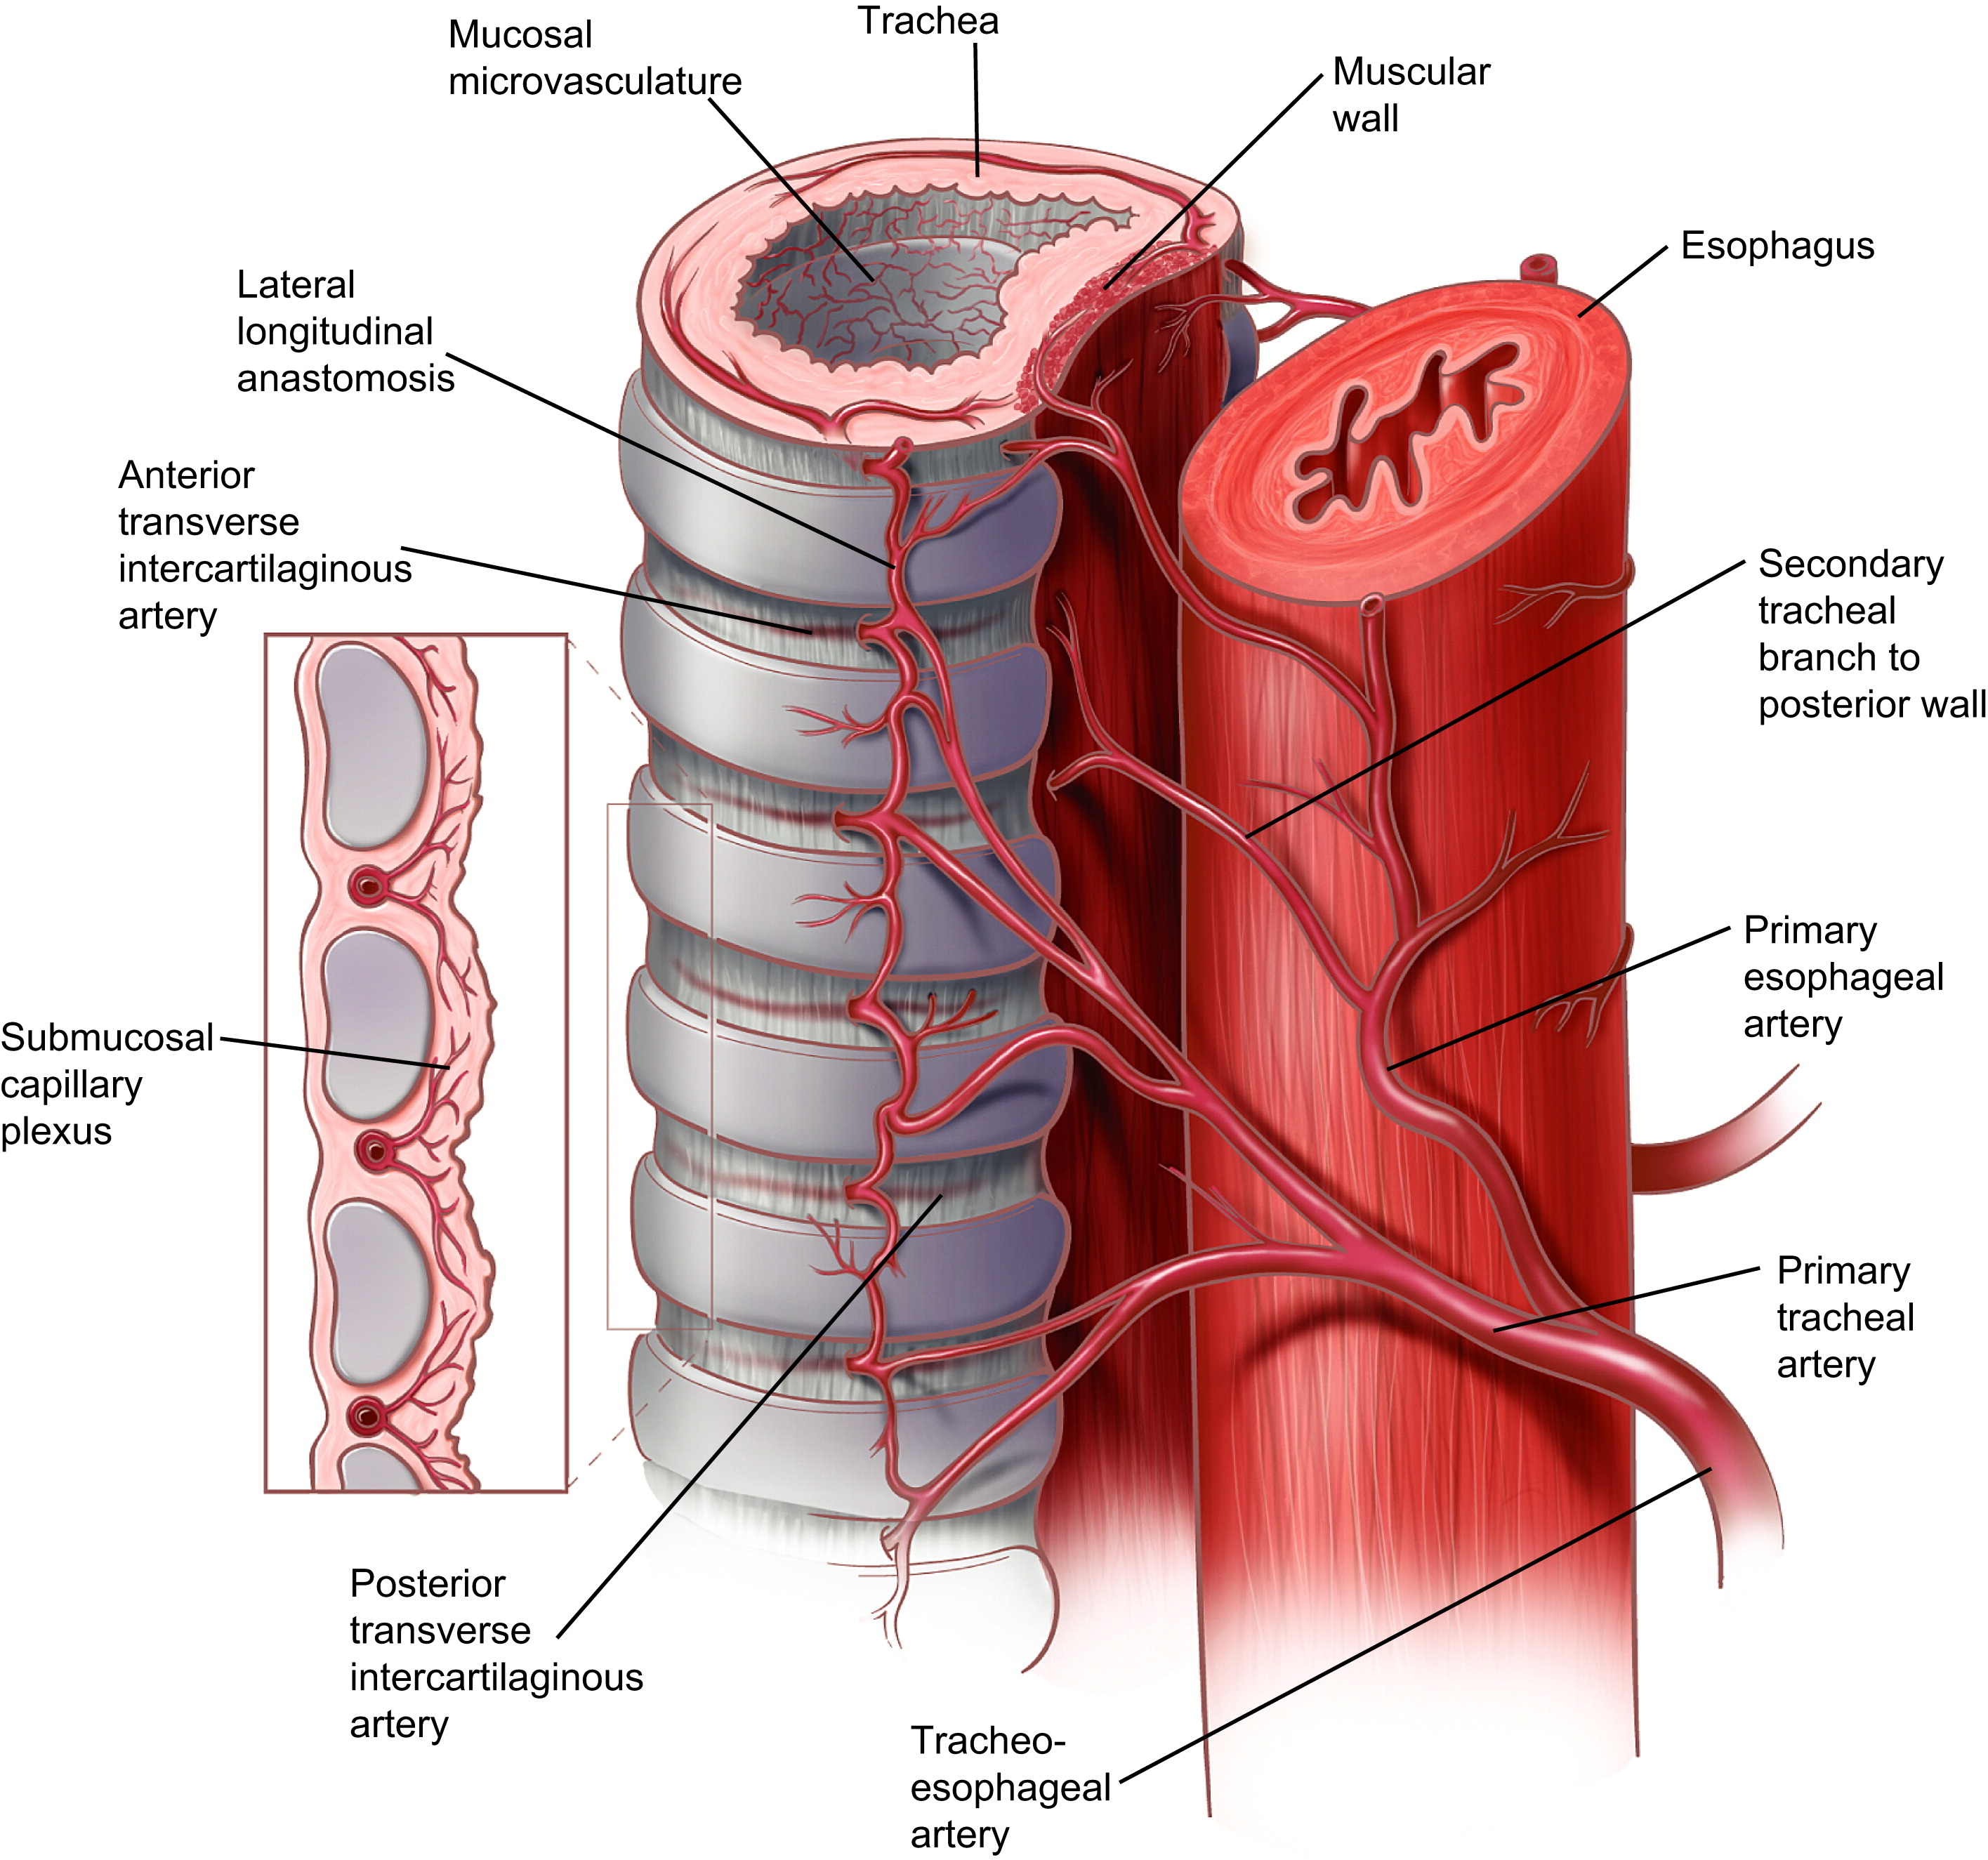 Anatomy Of The Trachea  Carina  And Bronchi